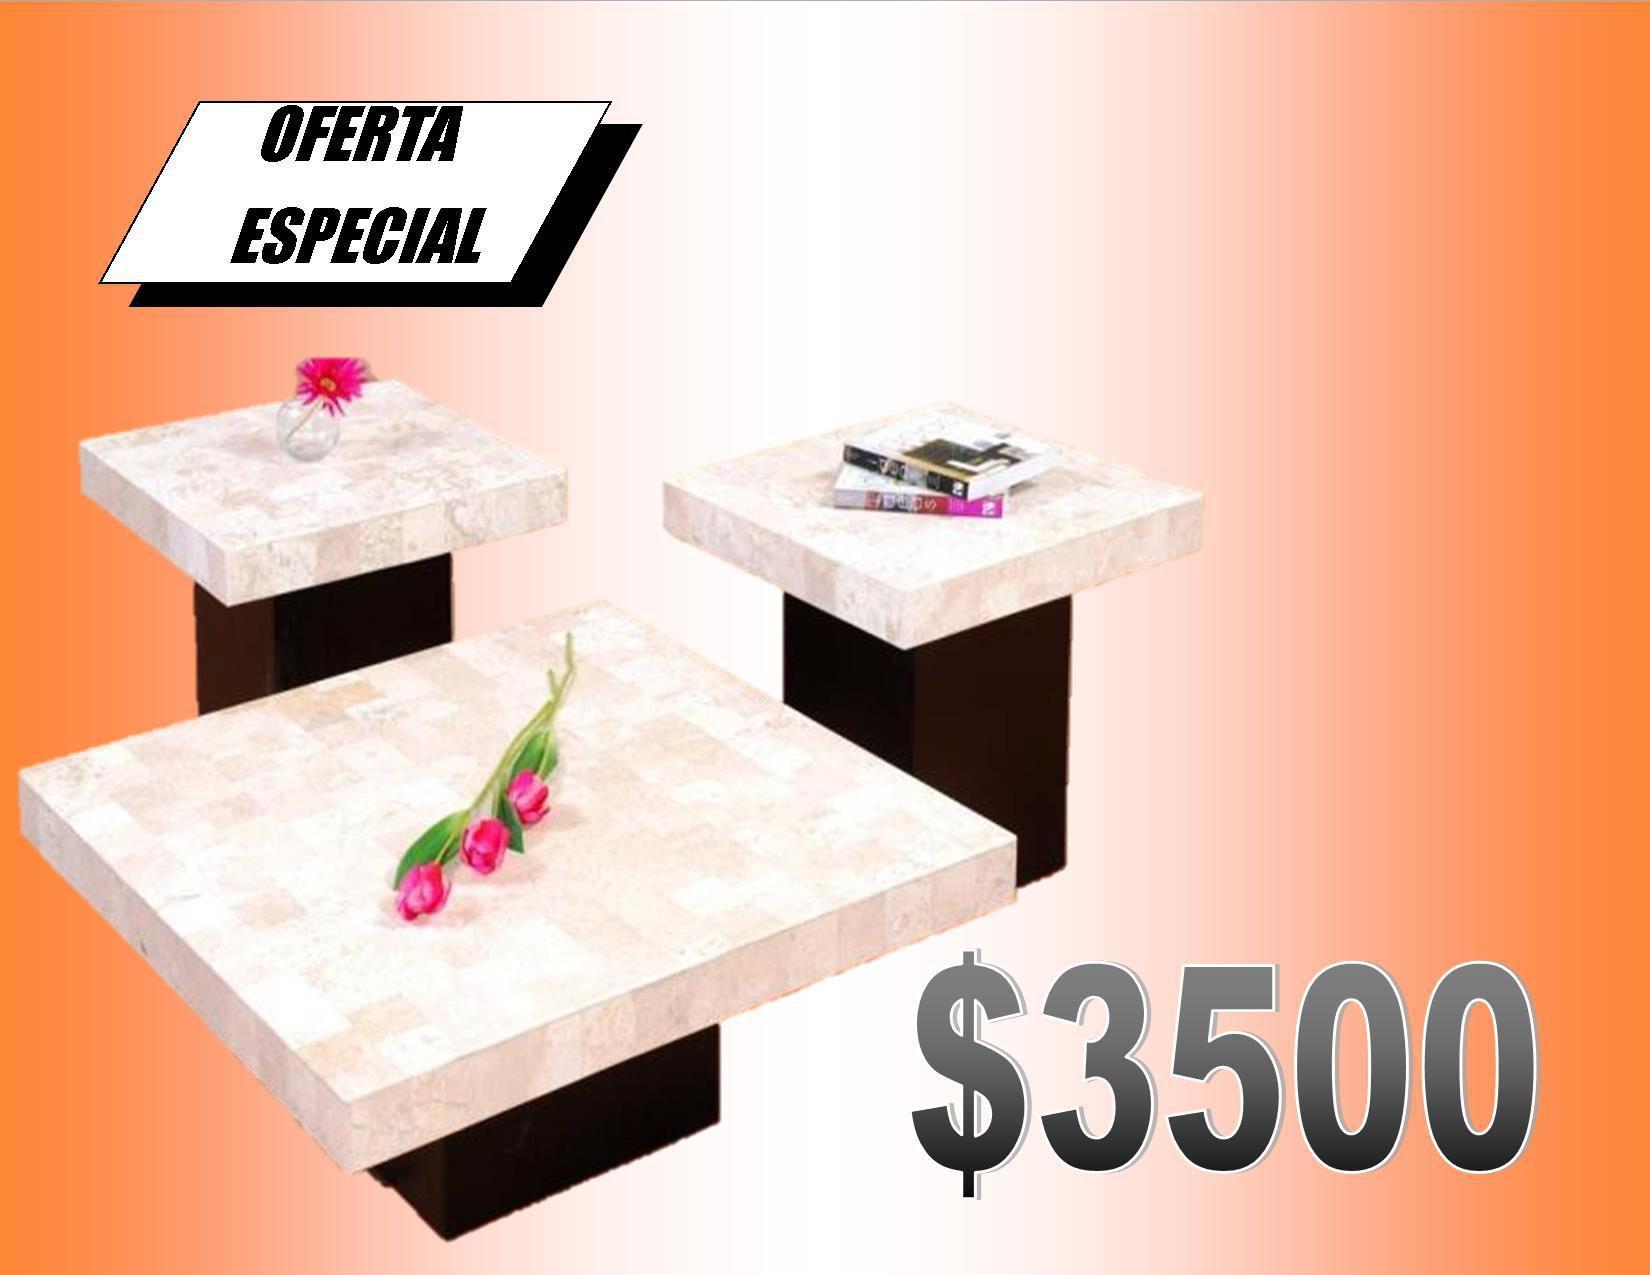 Mesas de centro marmol crema espa ol para sala for Marmol espanol precios